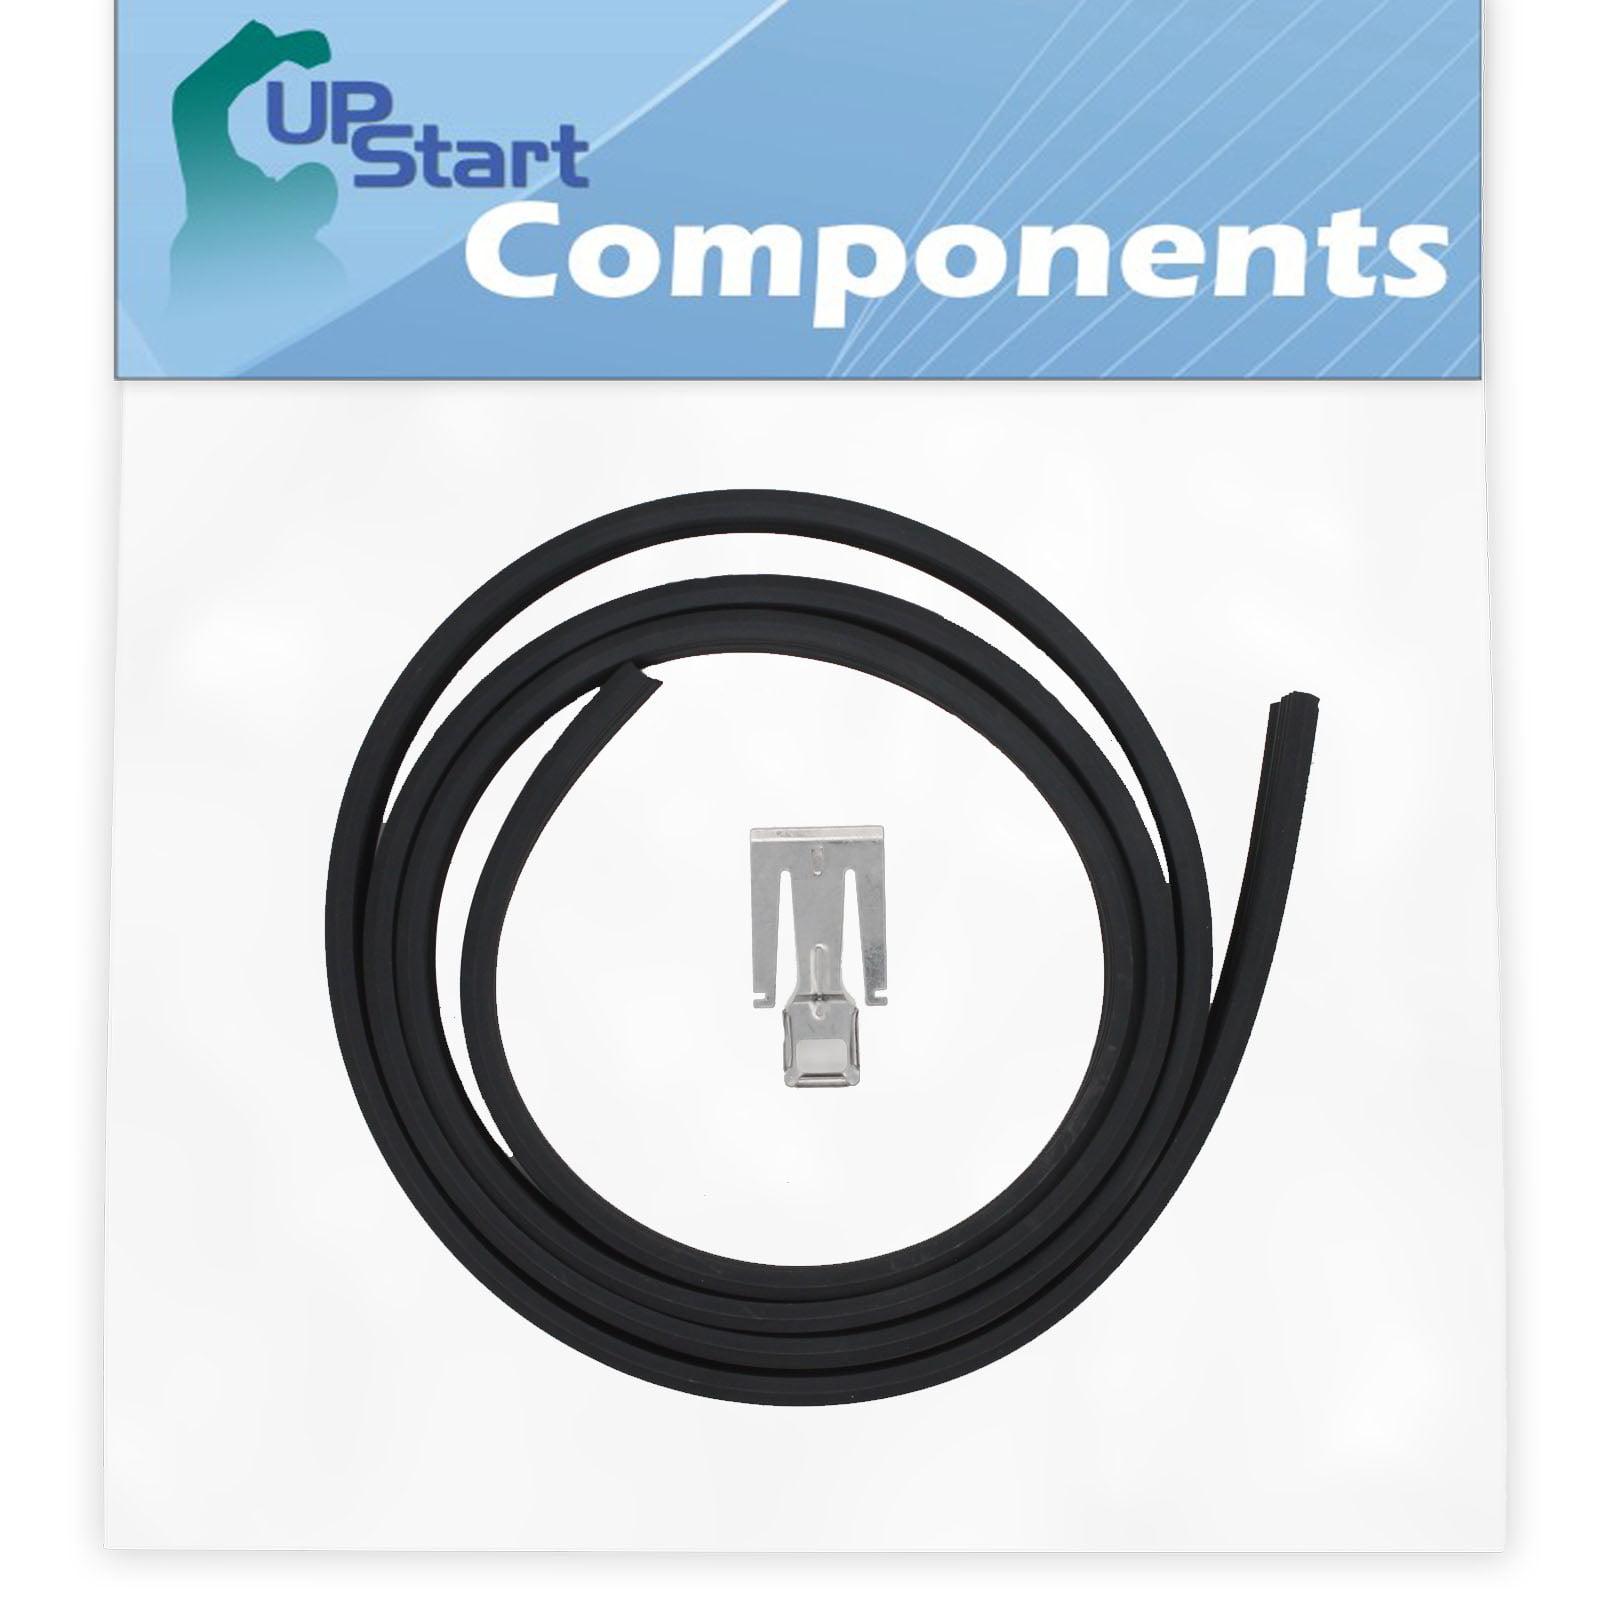 W10542314 Dishwasher Door Gasket Replacement for Whirlpool DU1055XTVS2 Dishwasher UpStart Components Brand Compatible with W10542314 Door Seal